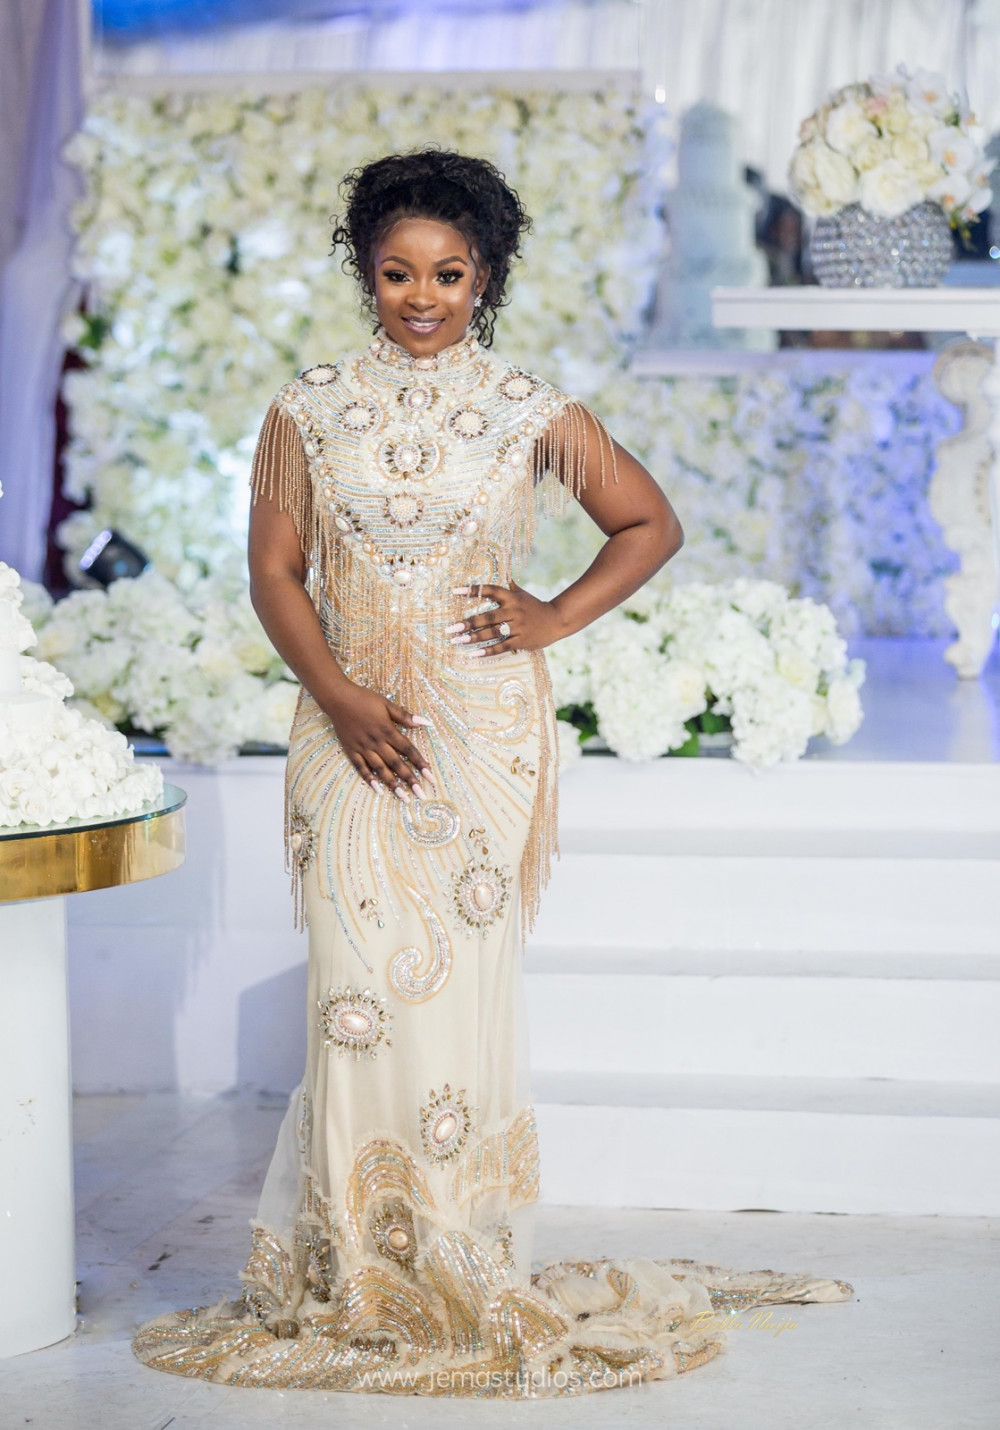 Sima And Kojos Spectacular Ghanaian Wedding Jema Studios